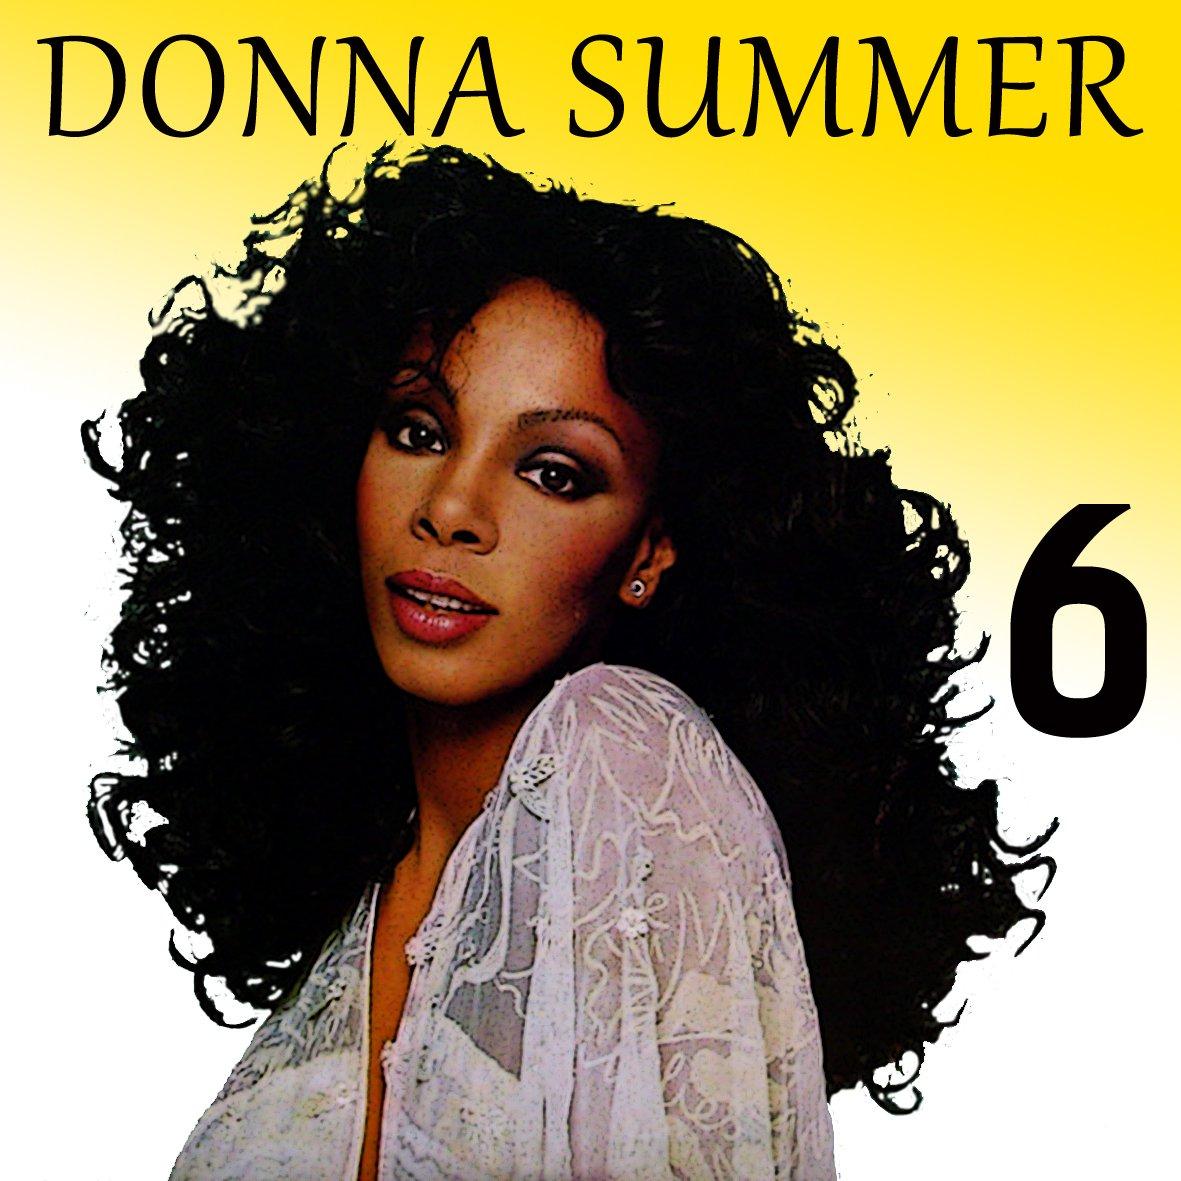 "BIOGRAFIAS, episodio 6, con DONNA SUMMER, recordando sus álbumes ""All Systems Go"" (1987) y ""Another Place And Time"" (1989)  Tras el podcast escuche en el mismo playlist las canciones completas    #podcast #podcasting #podcaster #musicpodcast #donnasummer"